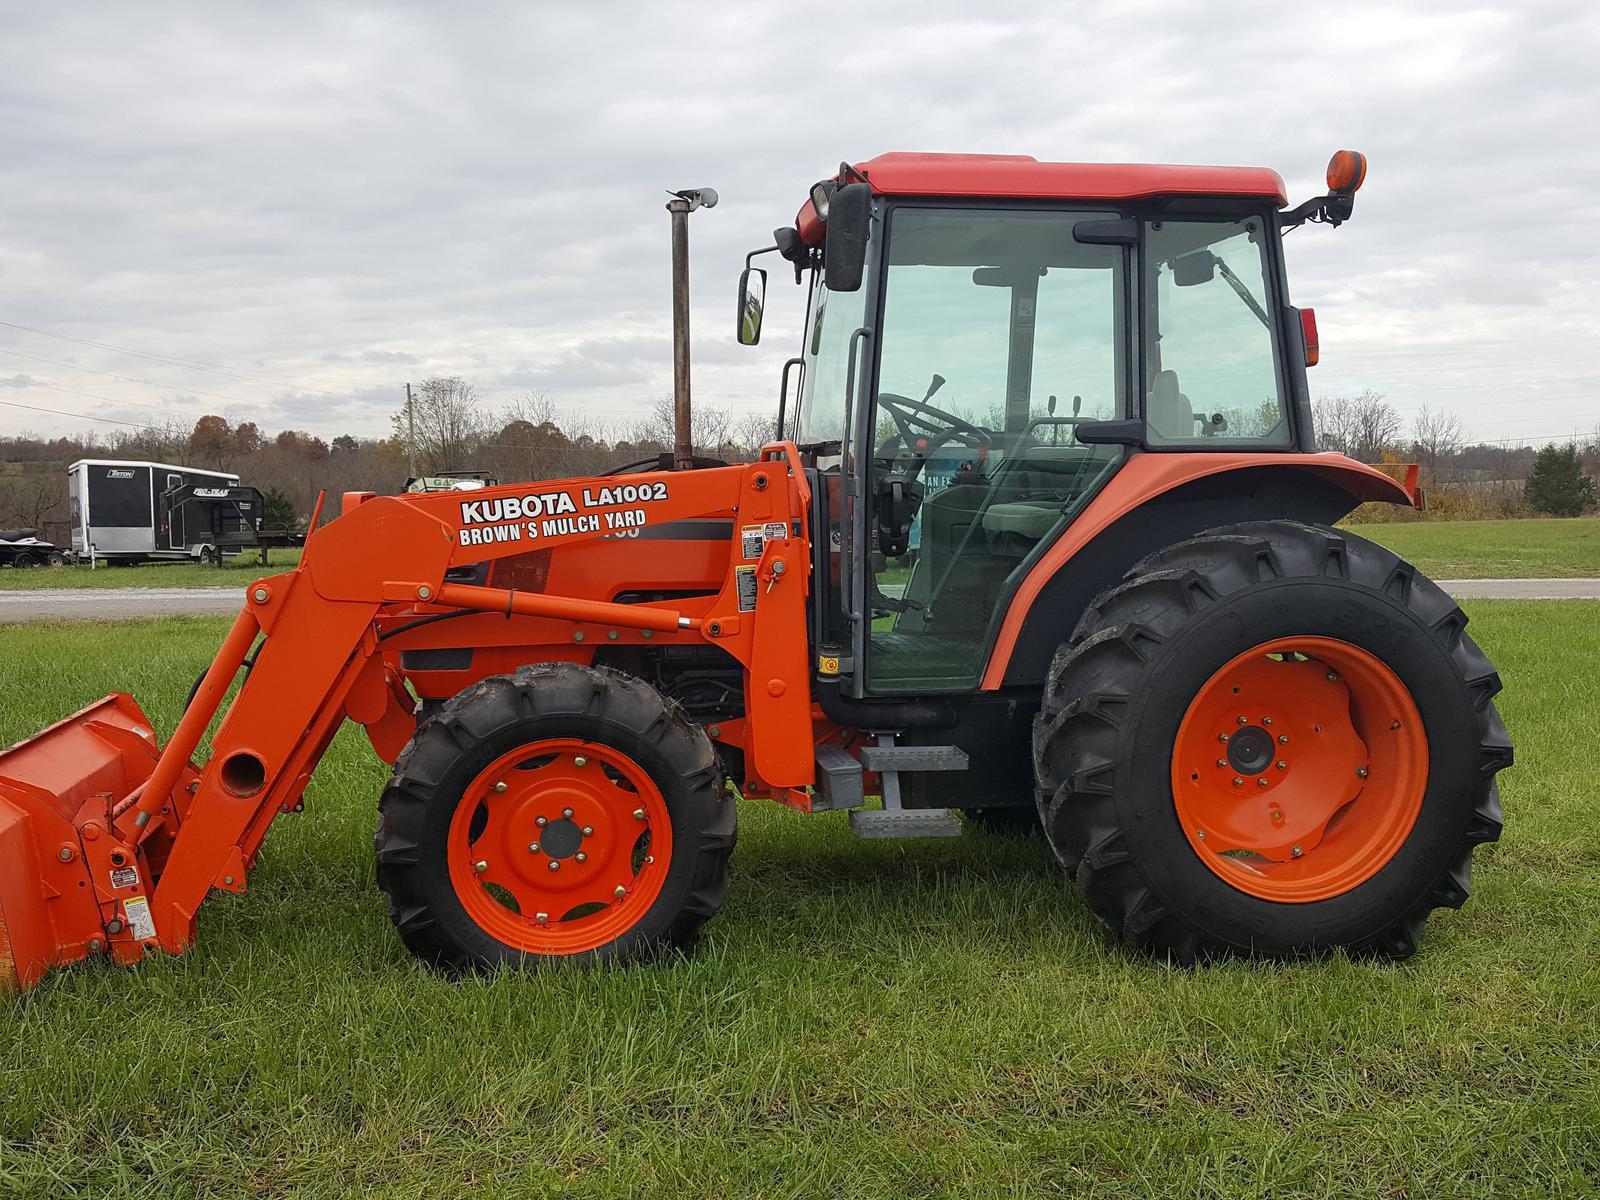 Kubota tractors for sale in kentucky - 2003 M5700